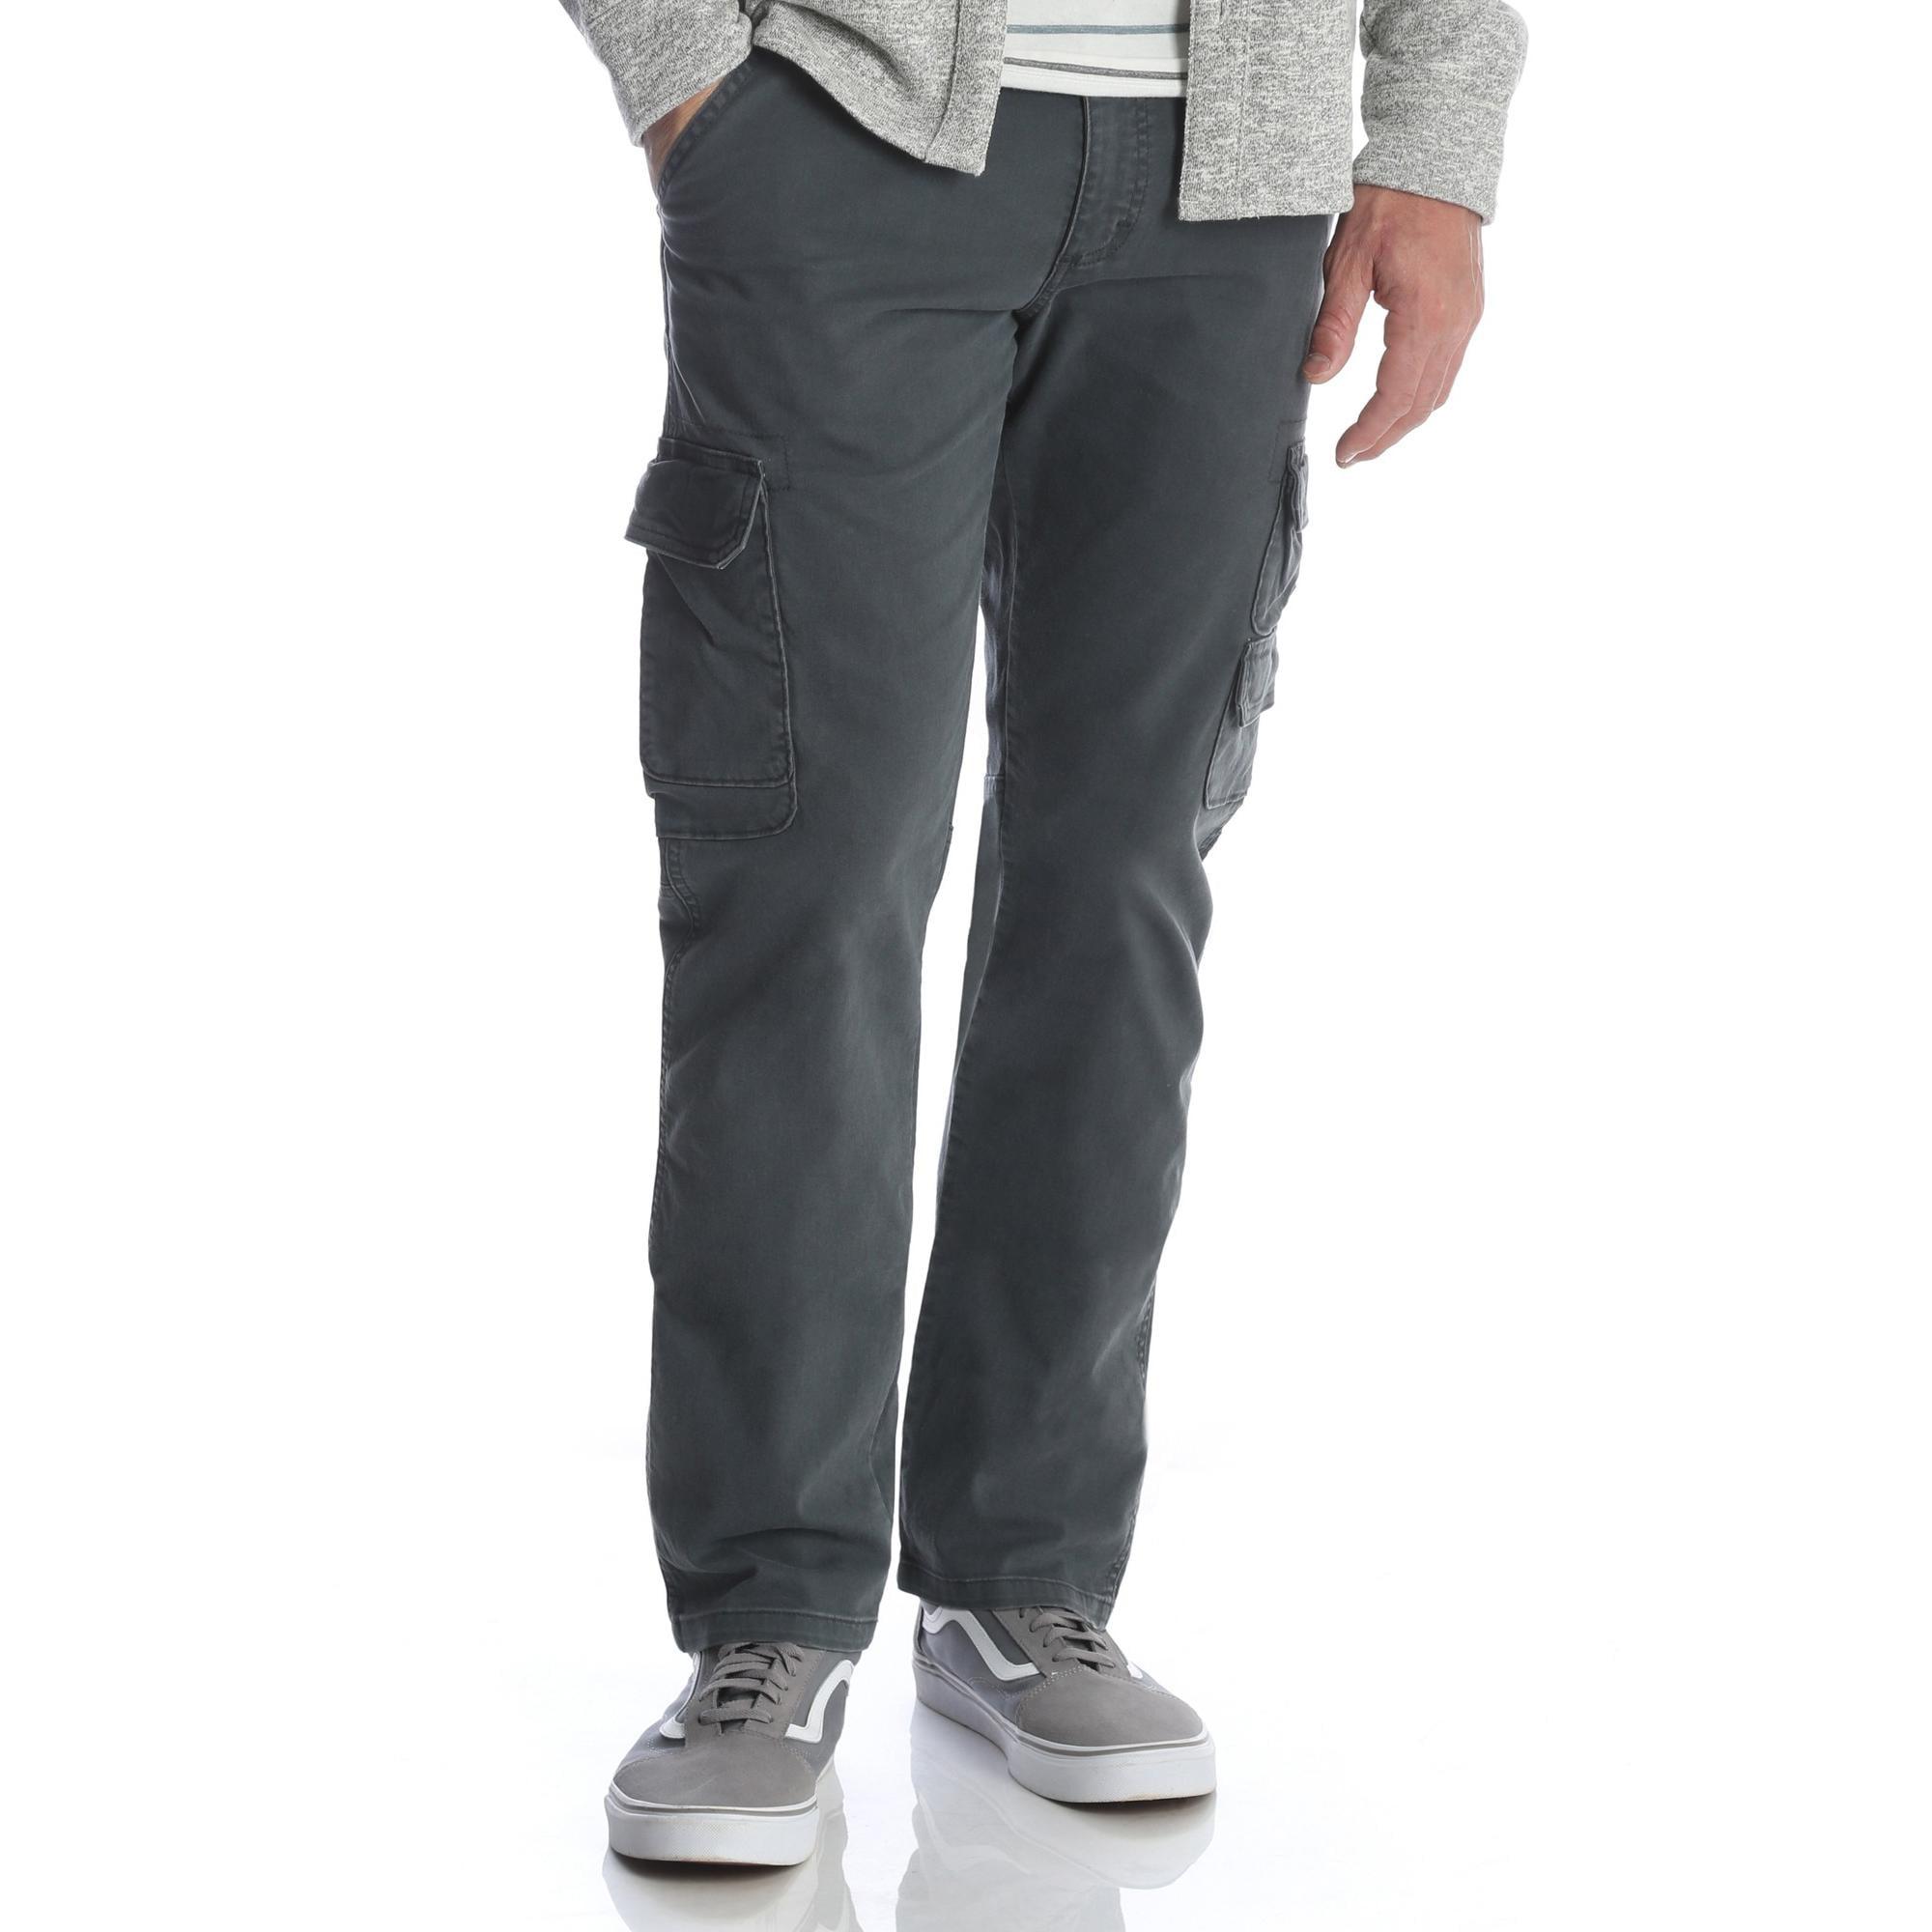 X-Future Mens Multi-Pockets Big /& Tall Utility Baggy Cargo Jogger Pants